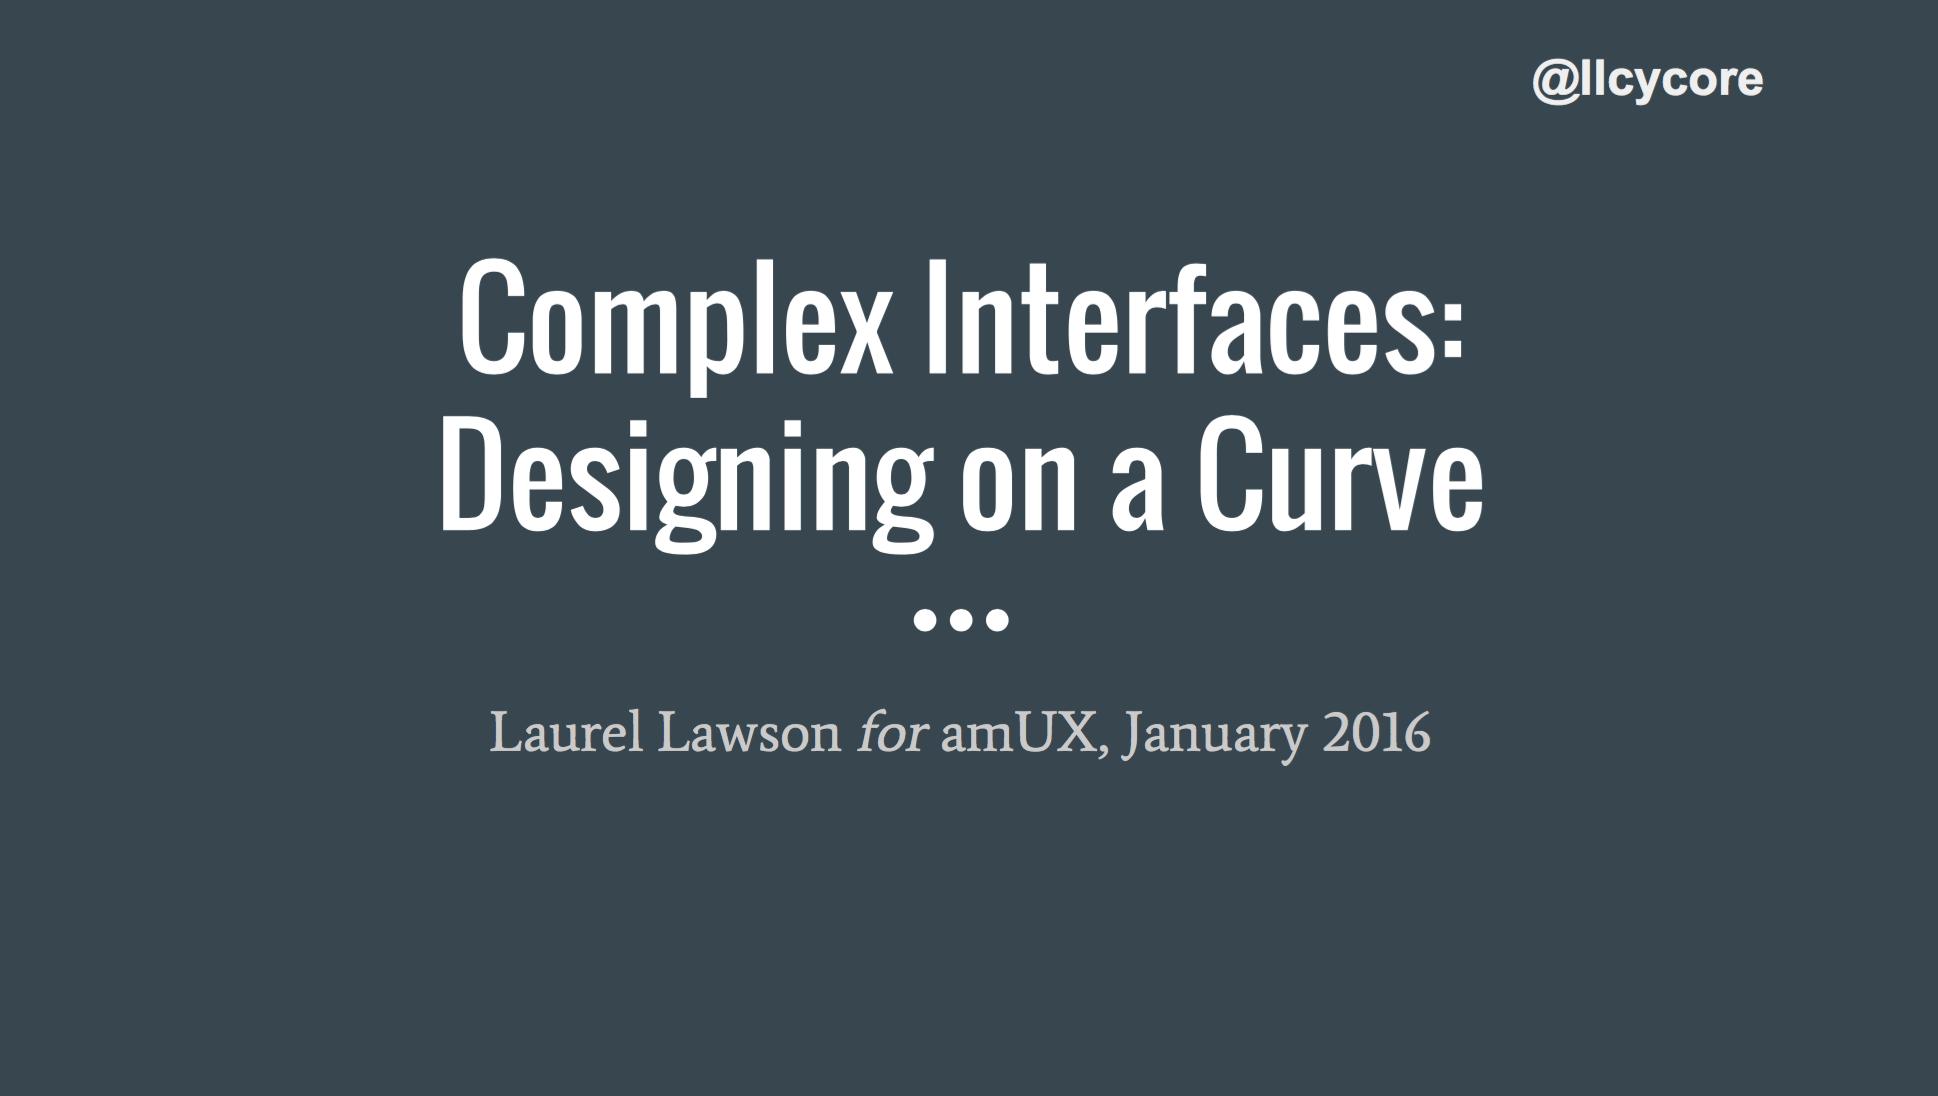 Complex Interfaces